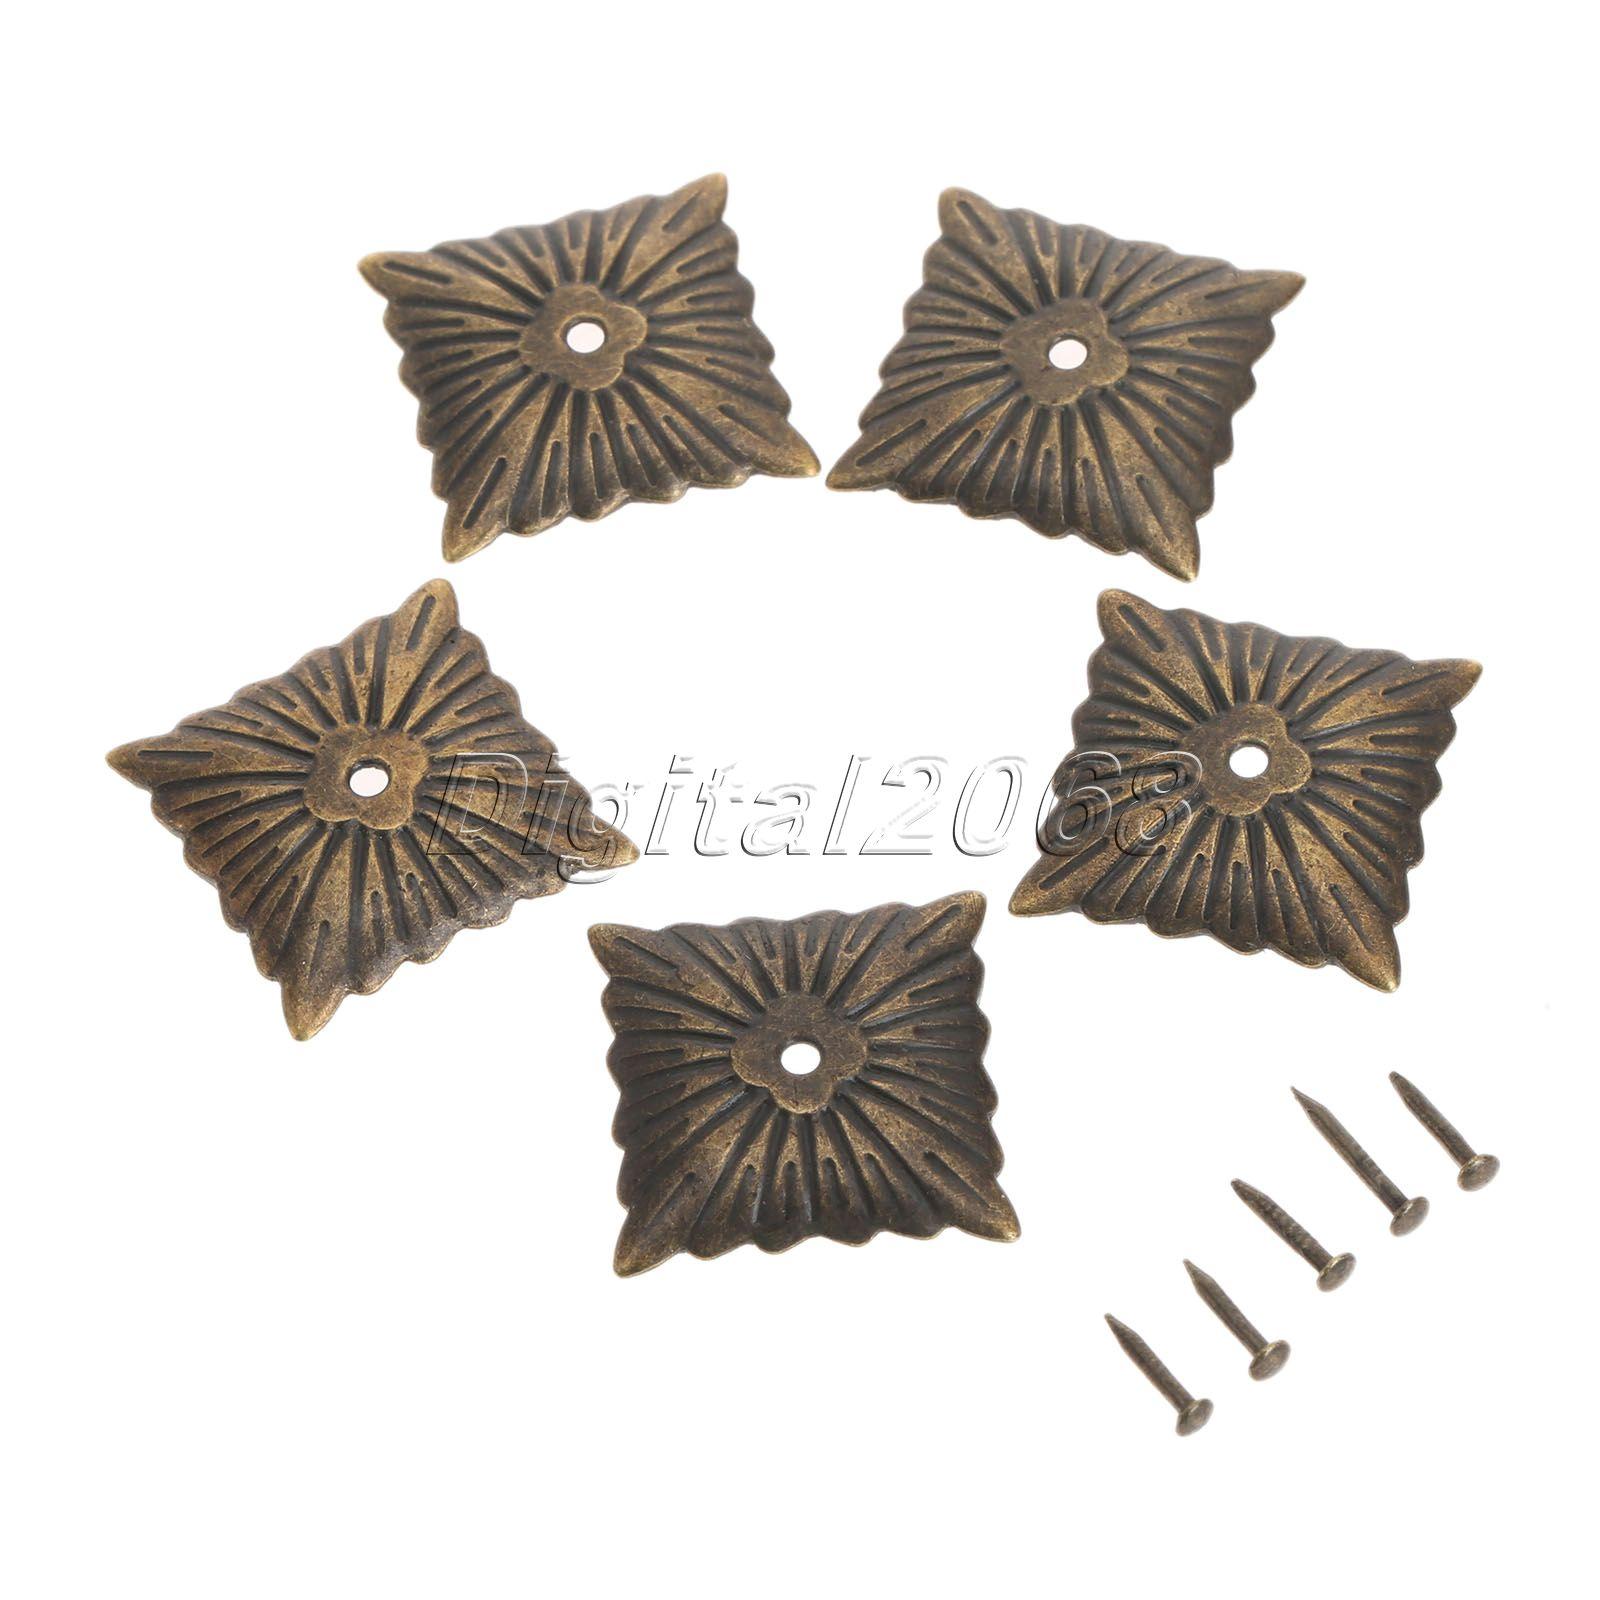 ⑤100Pcs Iron Bronze Antique Square Decorative Upholstery Nails Tack